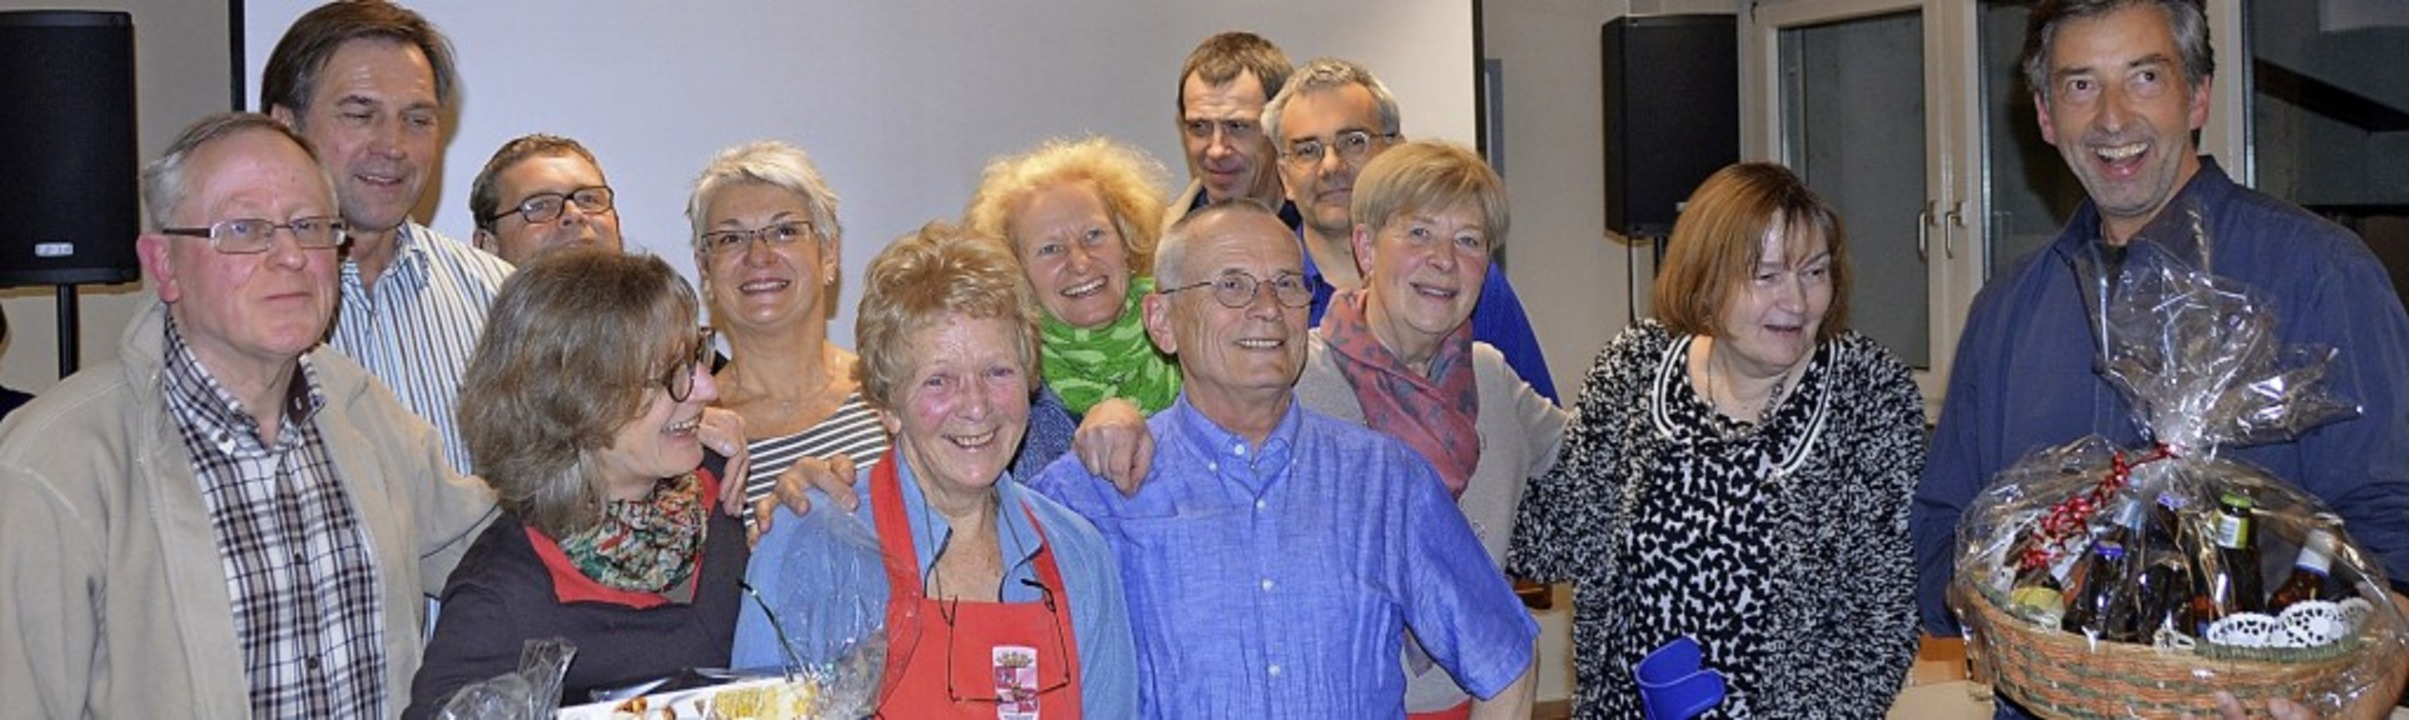 Vorsitzender Andre Christiaens (links)...itglieder des Freundeskreises Mouscron  | Foto: Horatio Gollin